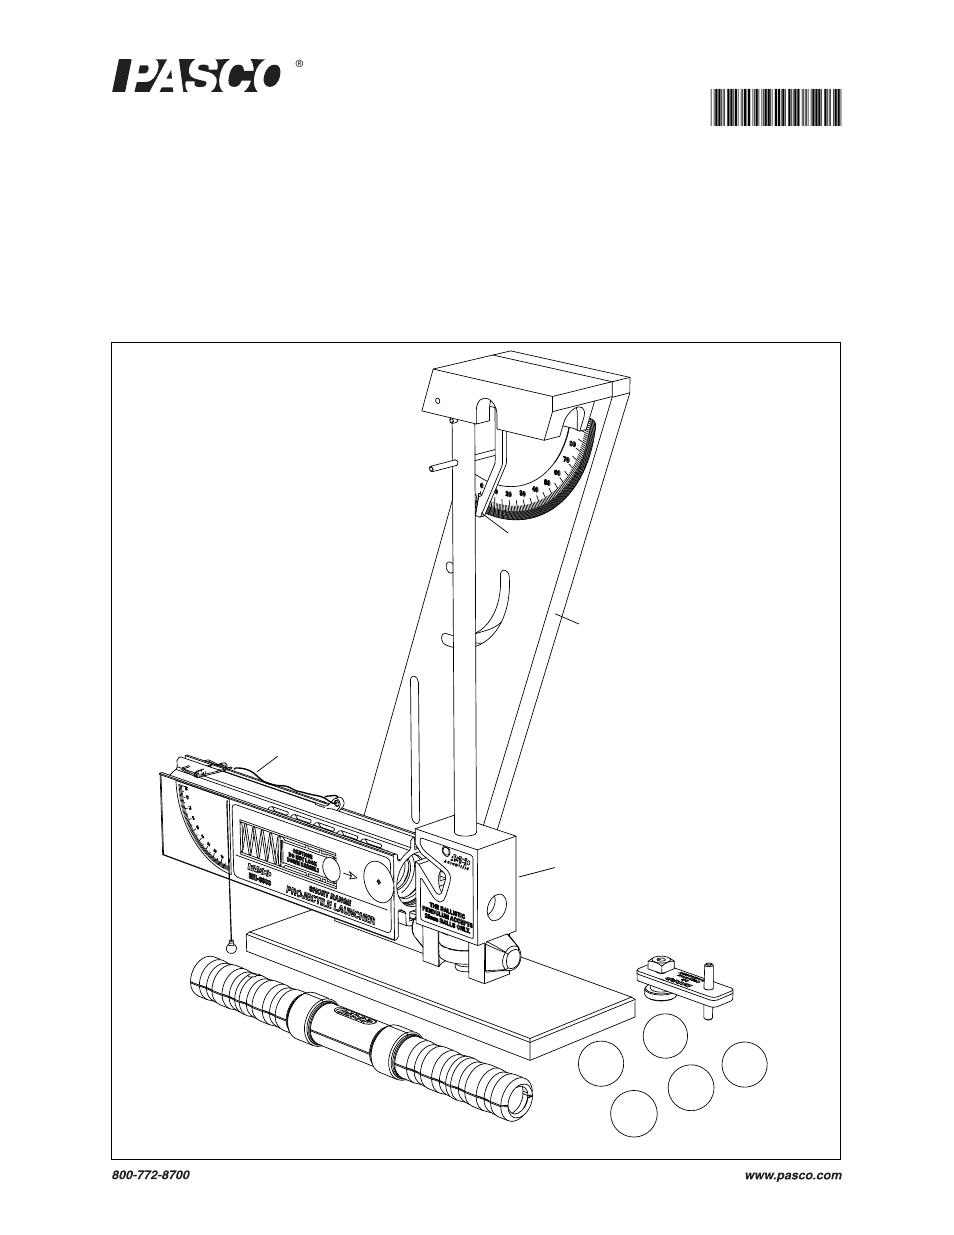 PASCO ME-6831 Ballistic Pendulum_Projectile Launcher User